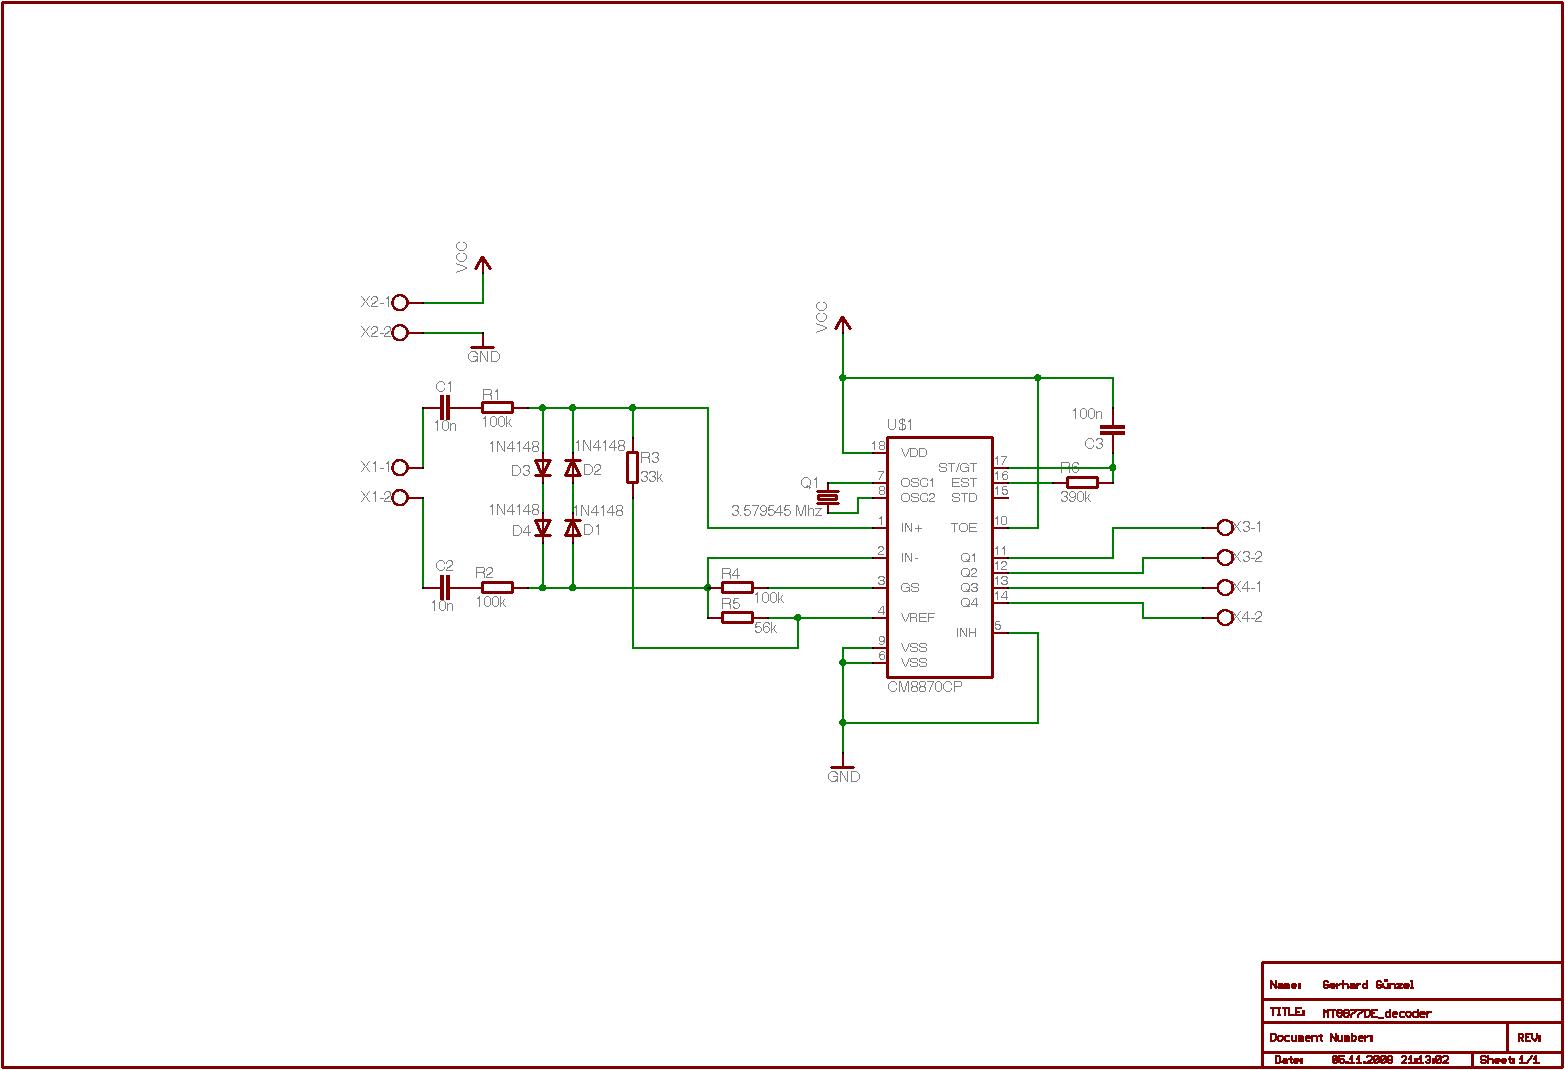 Dtmf Mit Gsm Modem Auswerten Decoder Using Mt8870de Preview Image For